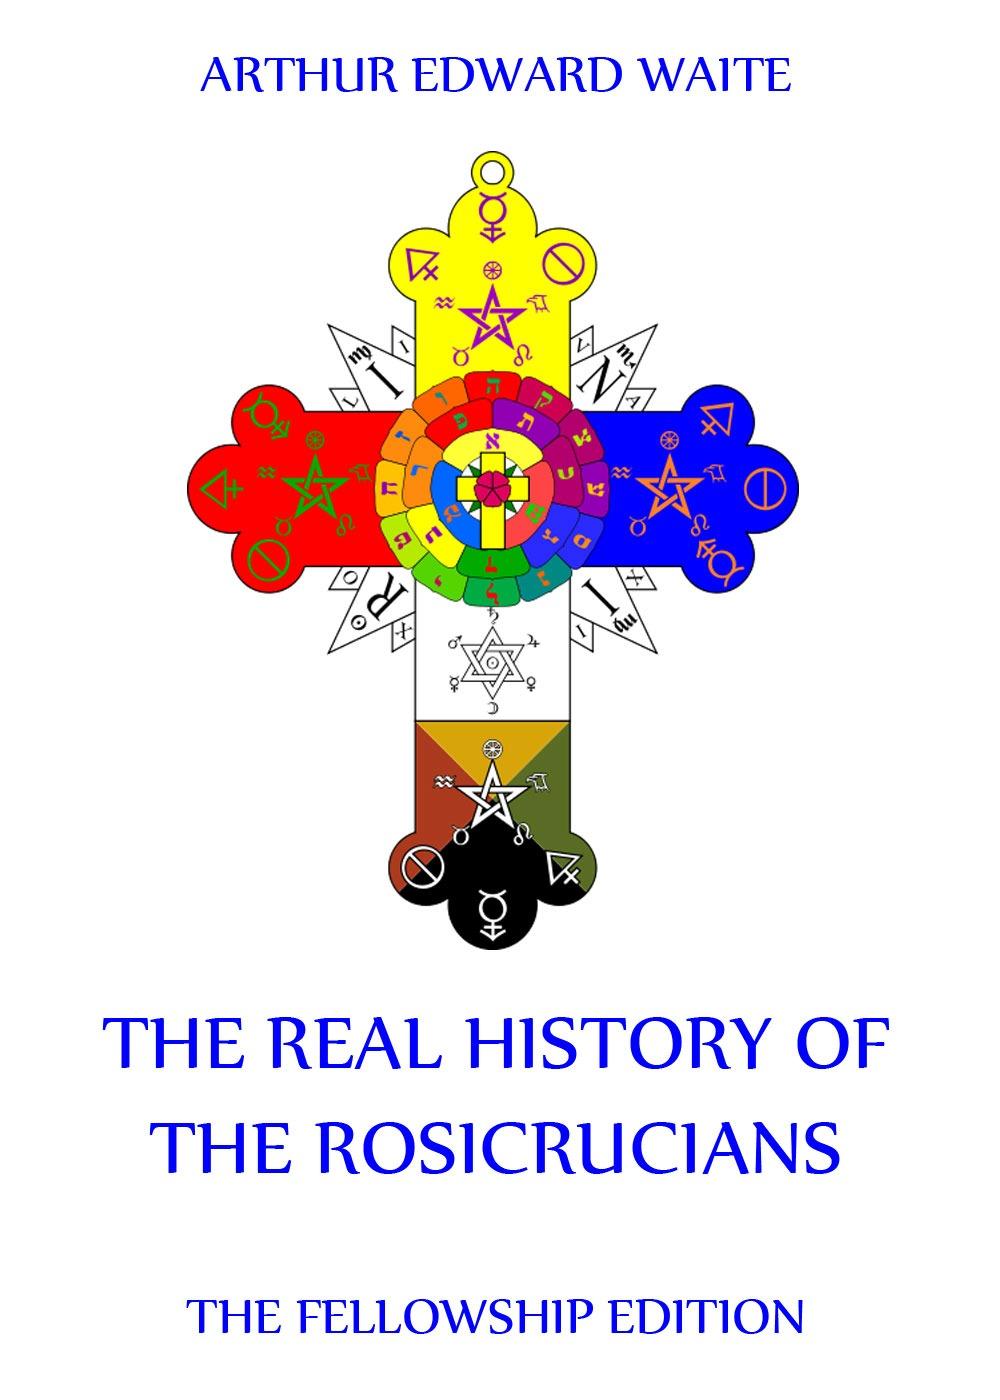 лучшая цена Arthur Edward Waite The Real History of the Rosicrucians